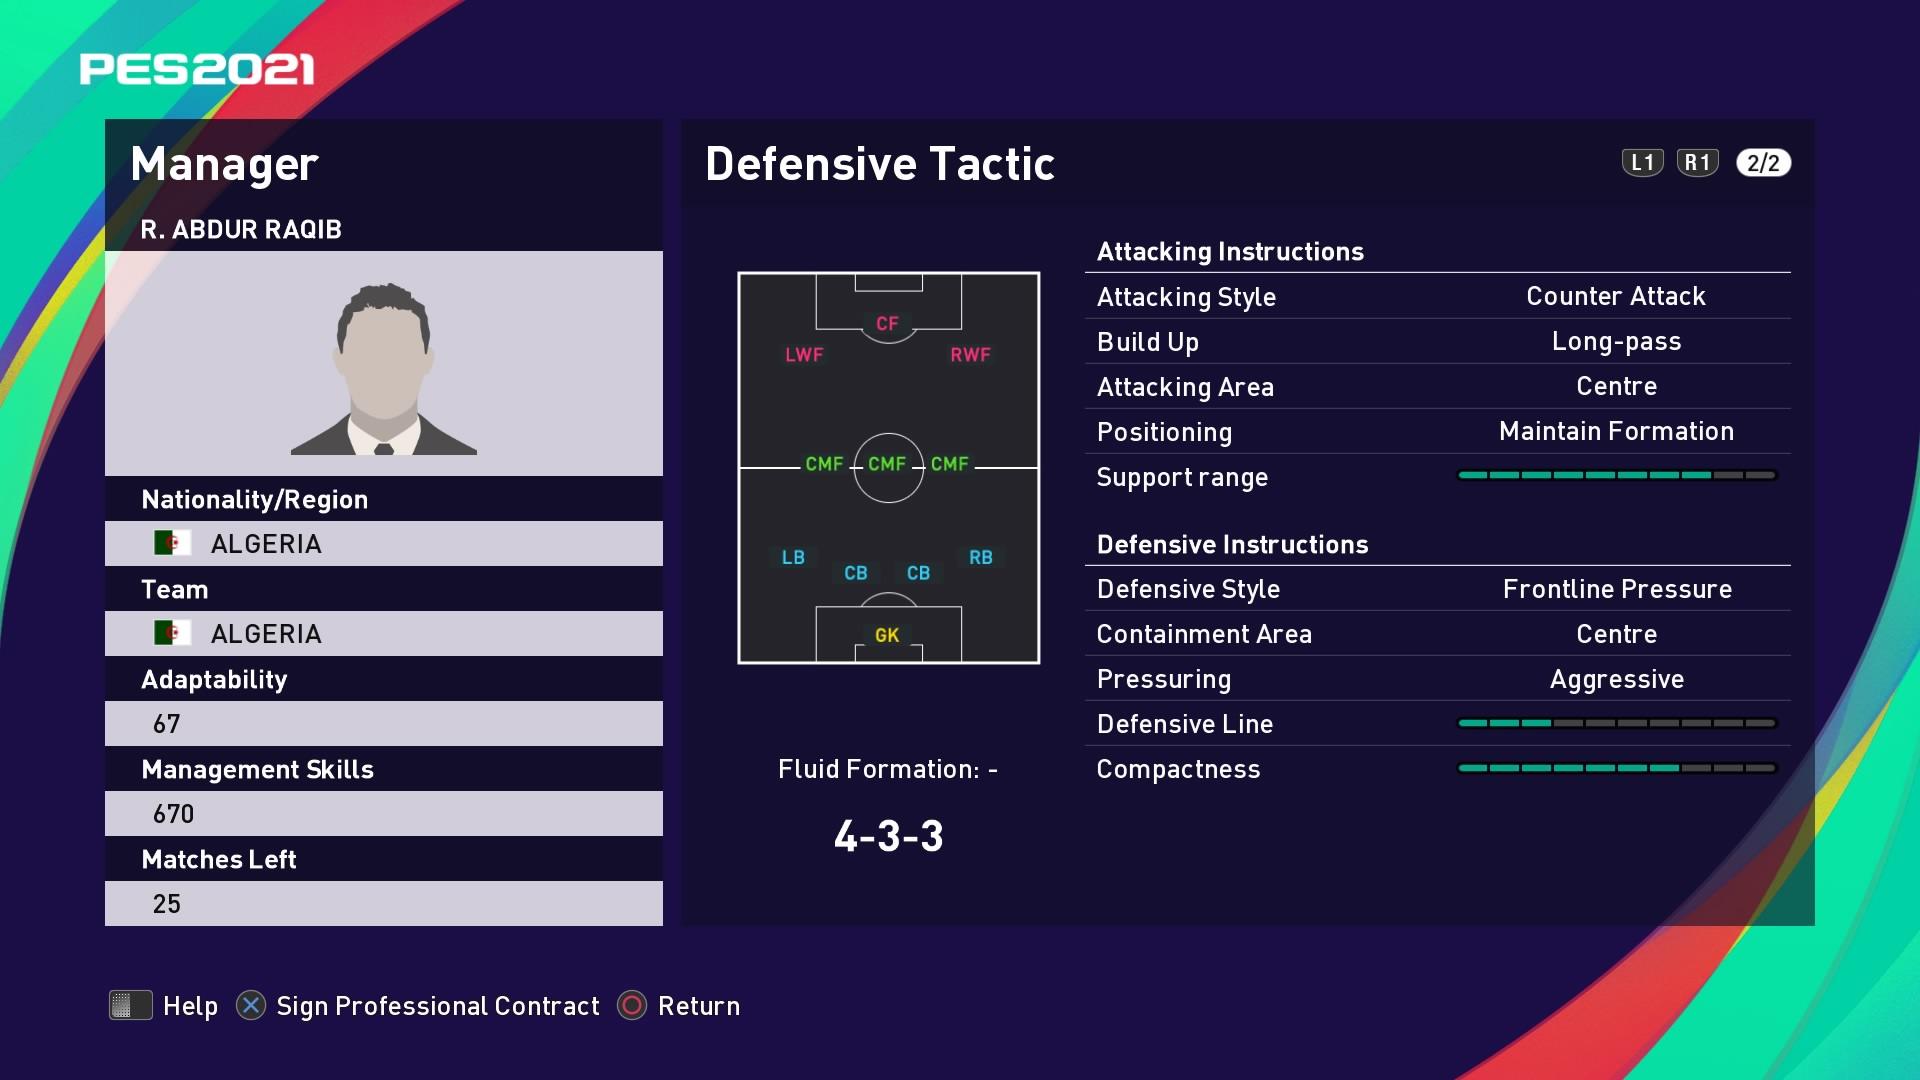 R. Abdur Raqib (Djamel Belmadi) Defensive Tactic in PES 2021 myClub